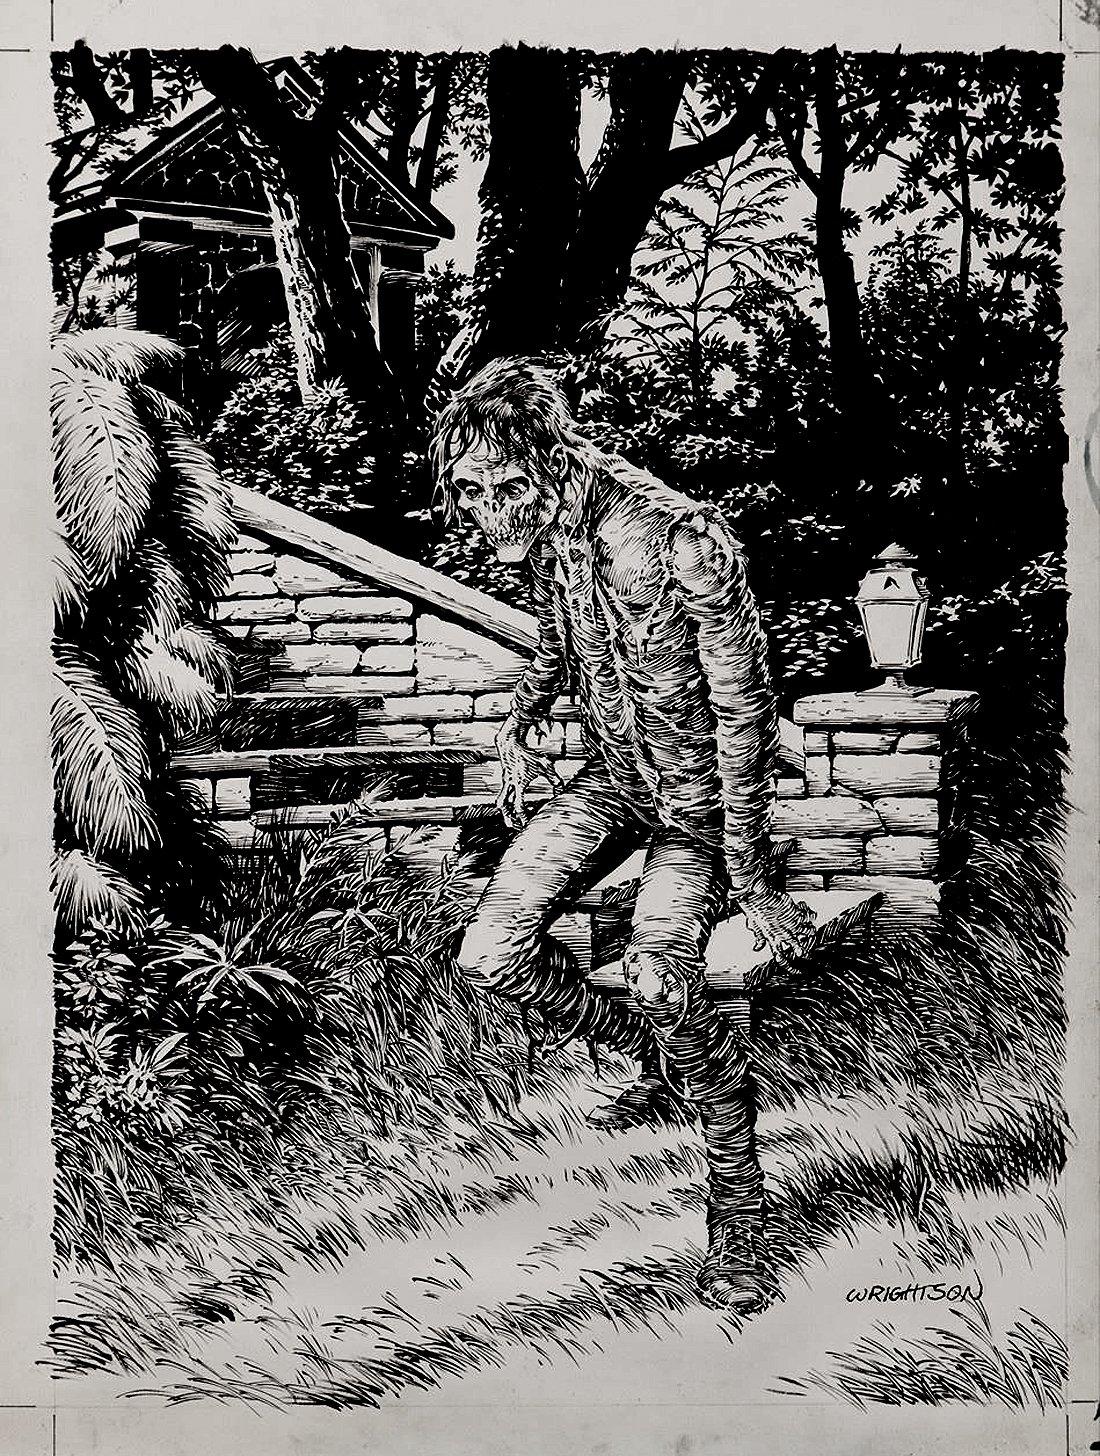 'Gardens of the Dead' Portfolio Cover Art(Large Art)